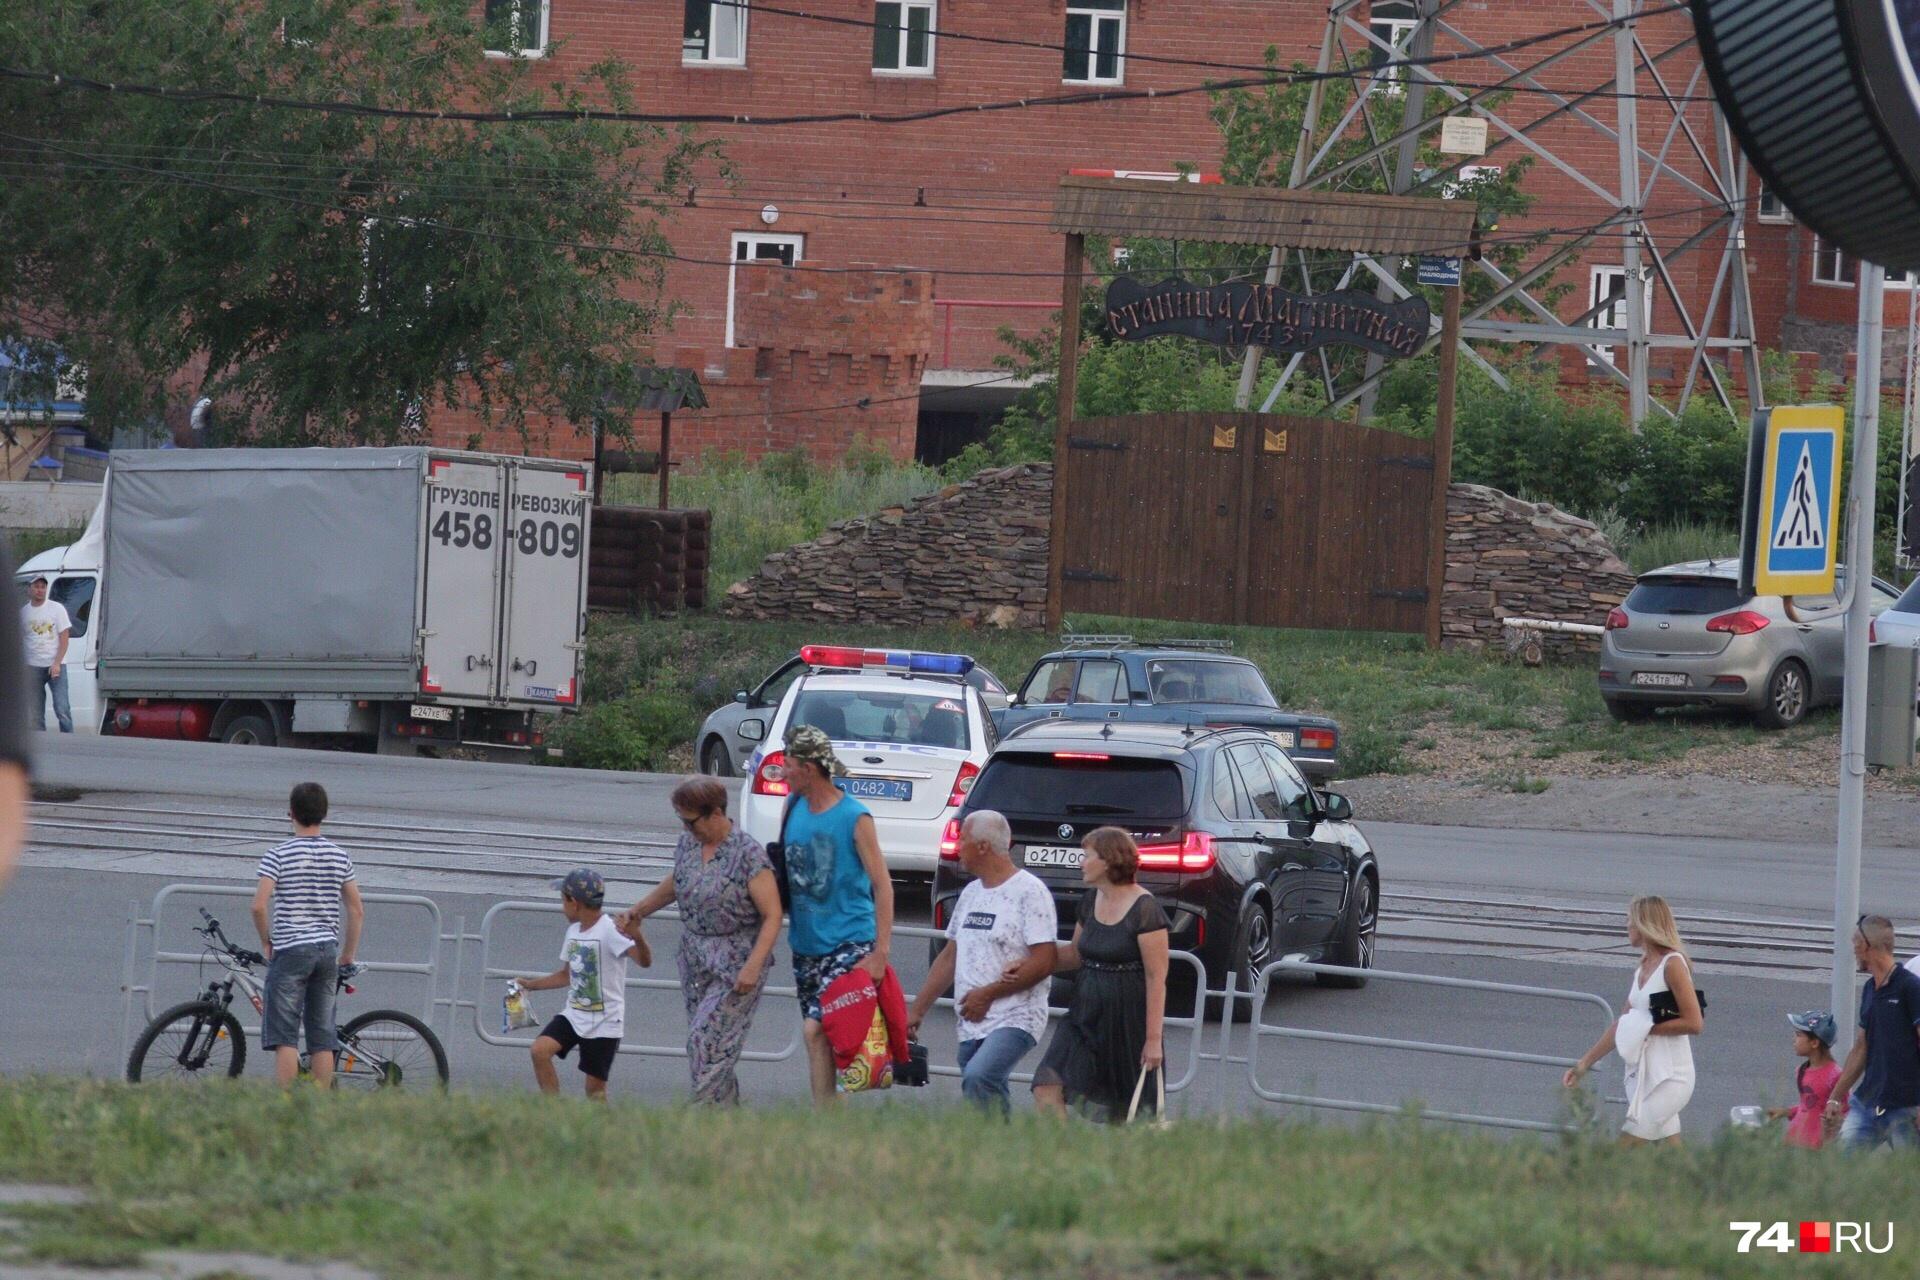 Кортеж чиновников умчался с концерта на аглофабрику, куда скоро приедет Путин